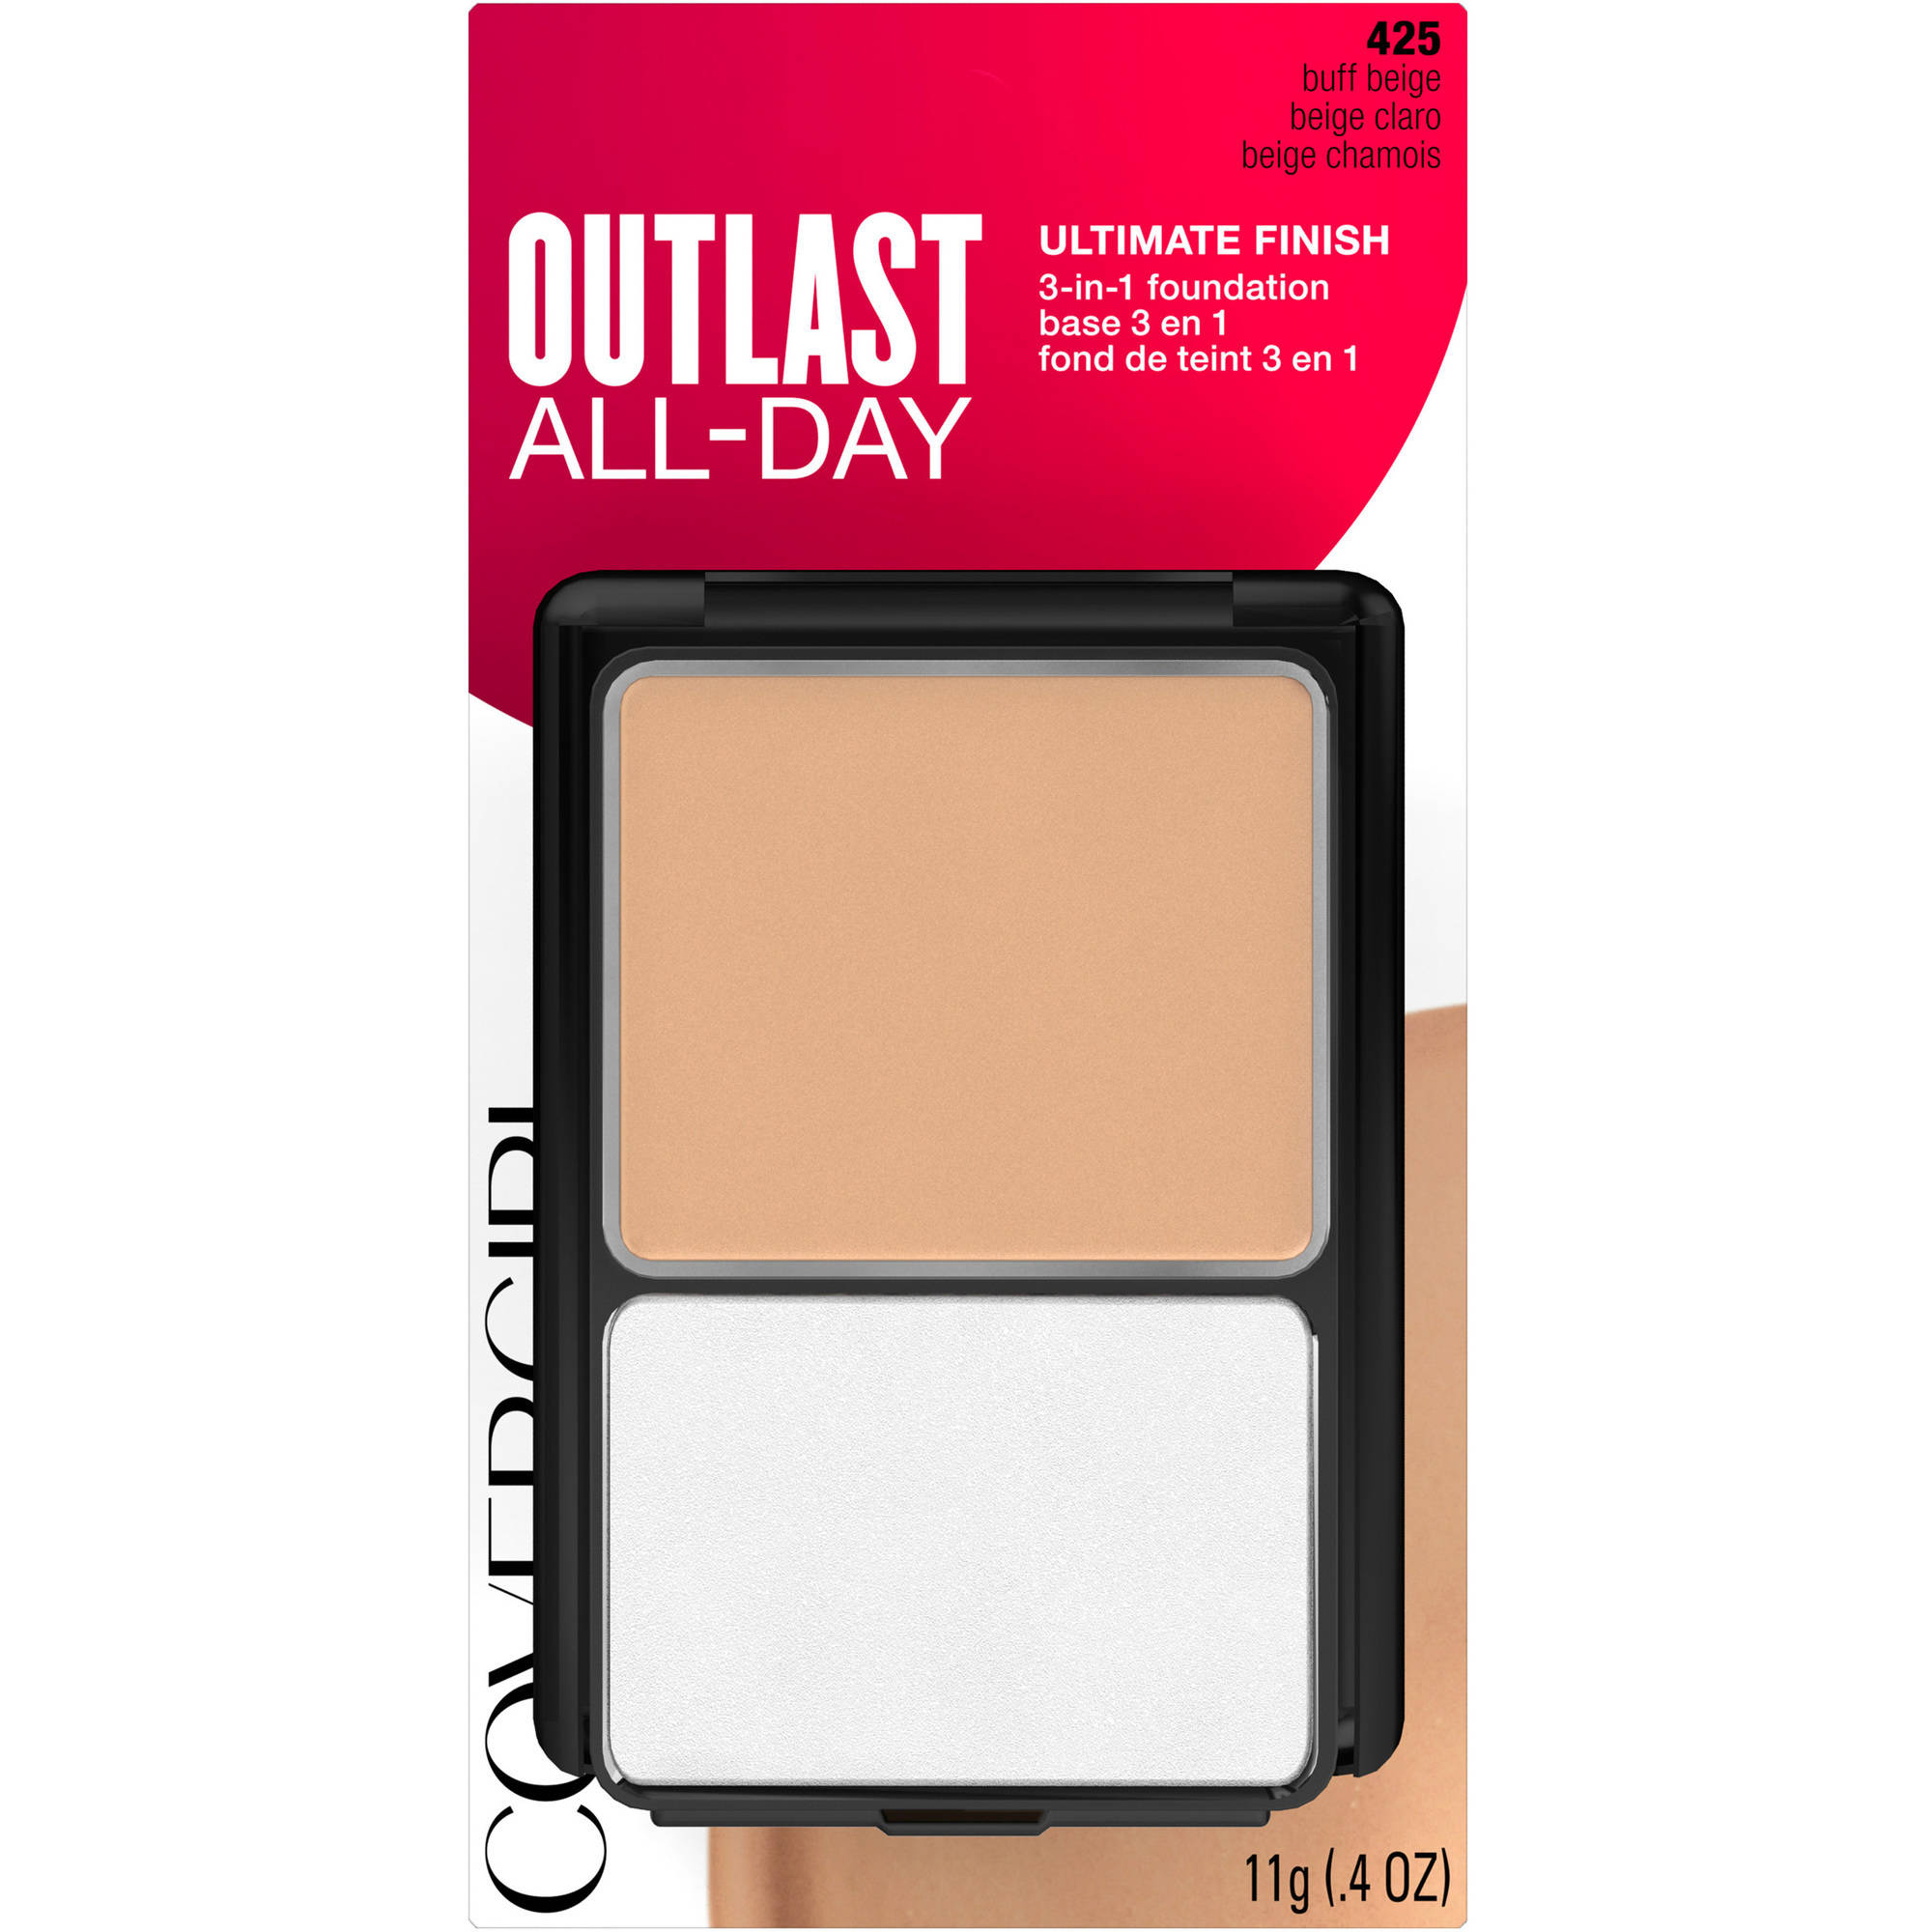 Covergirl Ultimate Finish Liquid Powder Makeup